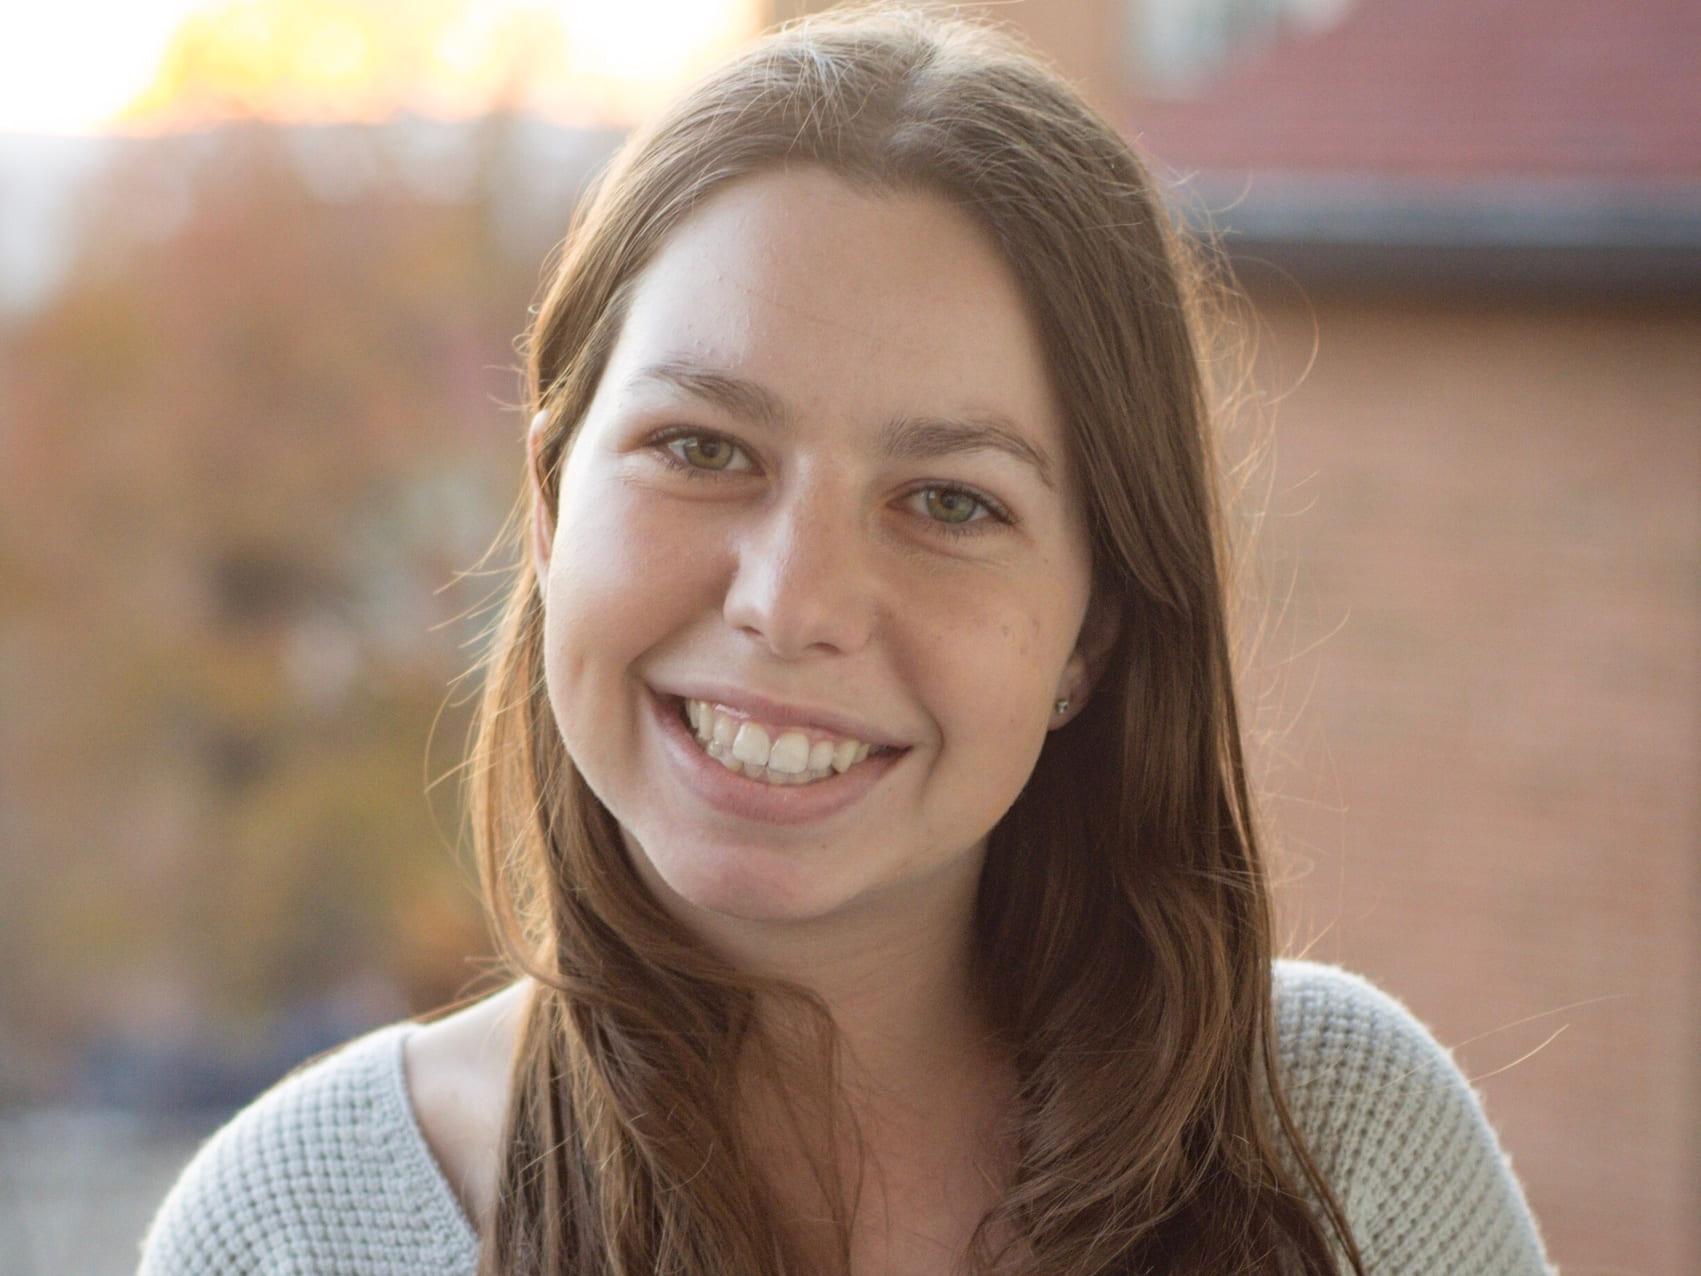 Cornell engineering student Amanda